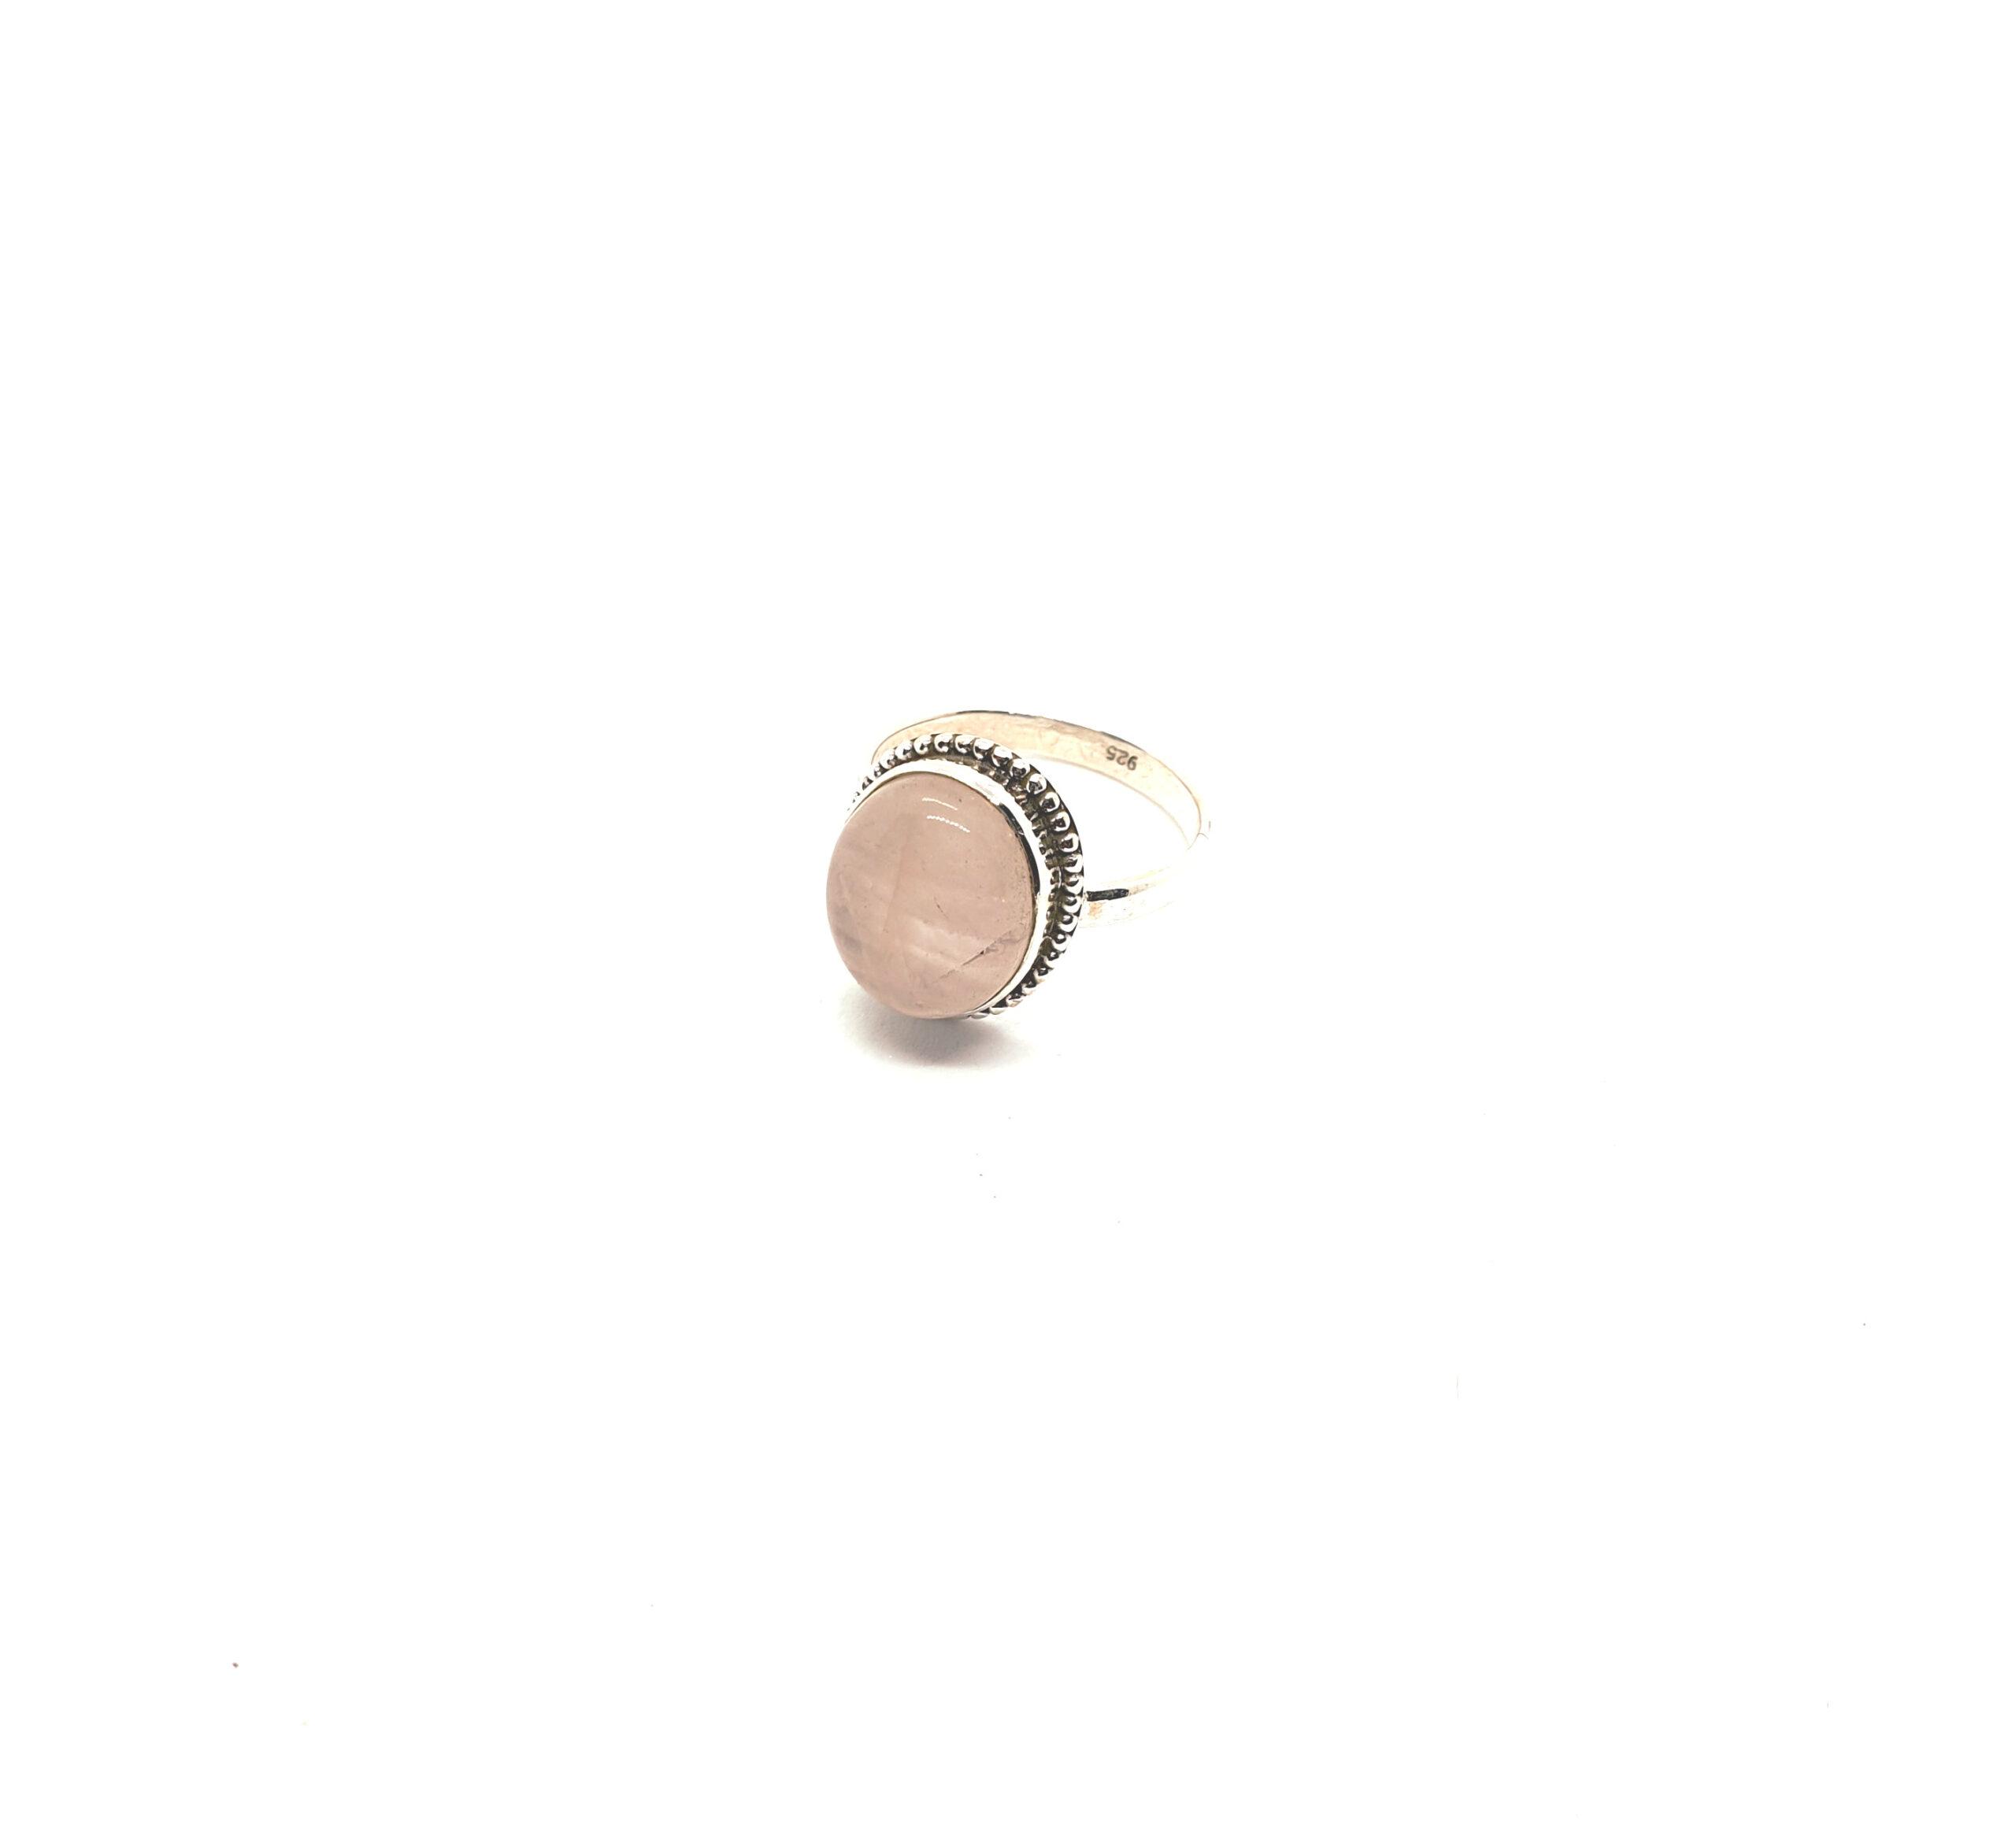 Photo moonstone ring 2